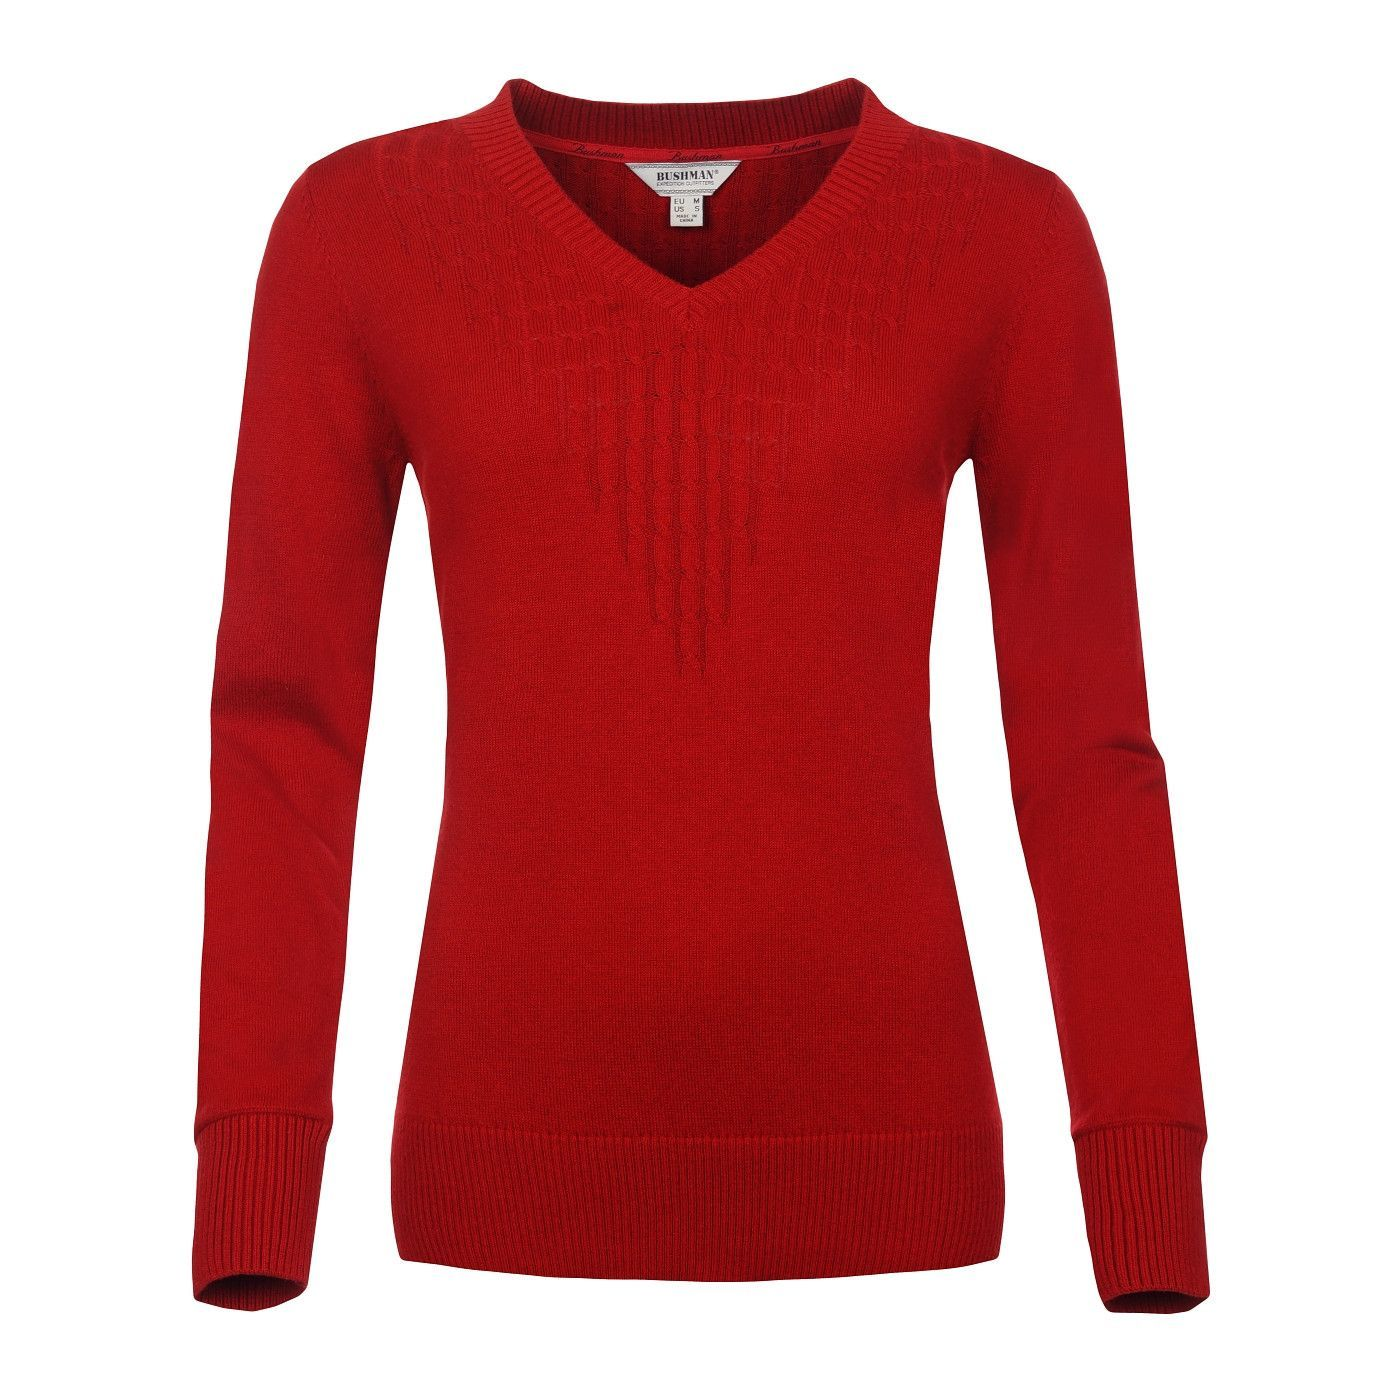 Front image of the Bushmanshop Biorka women's red cotton wool ...